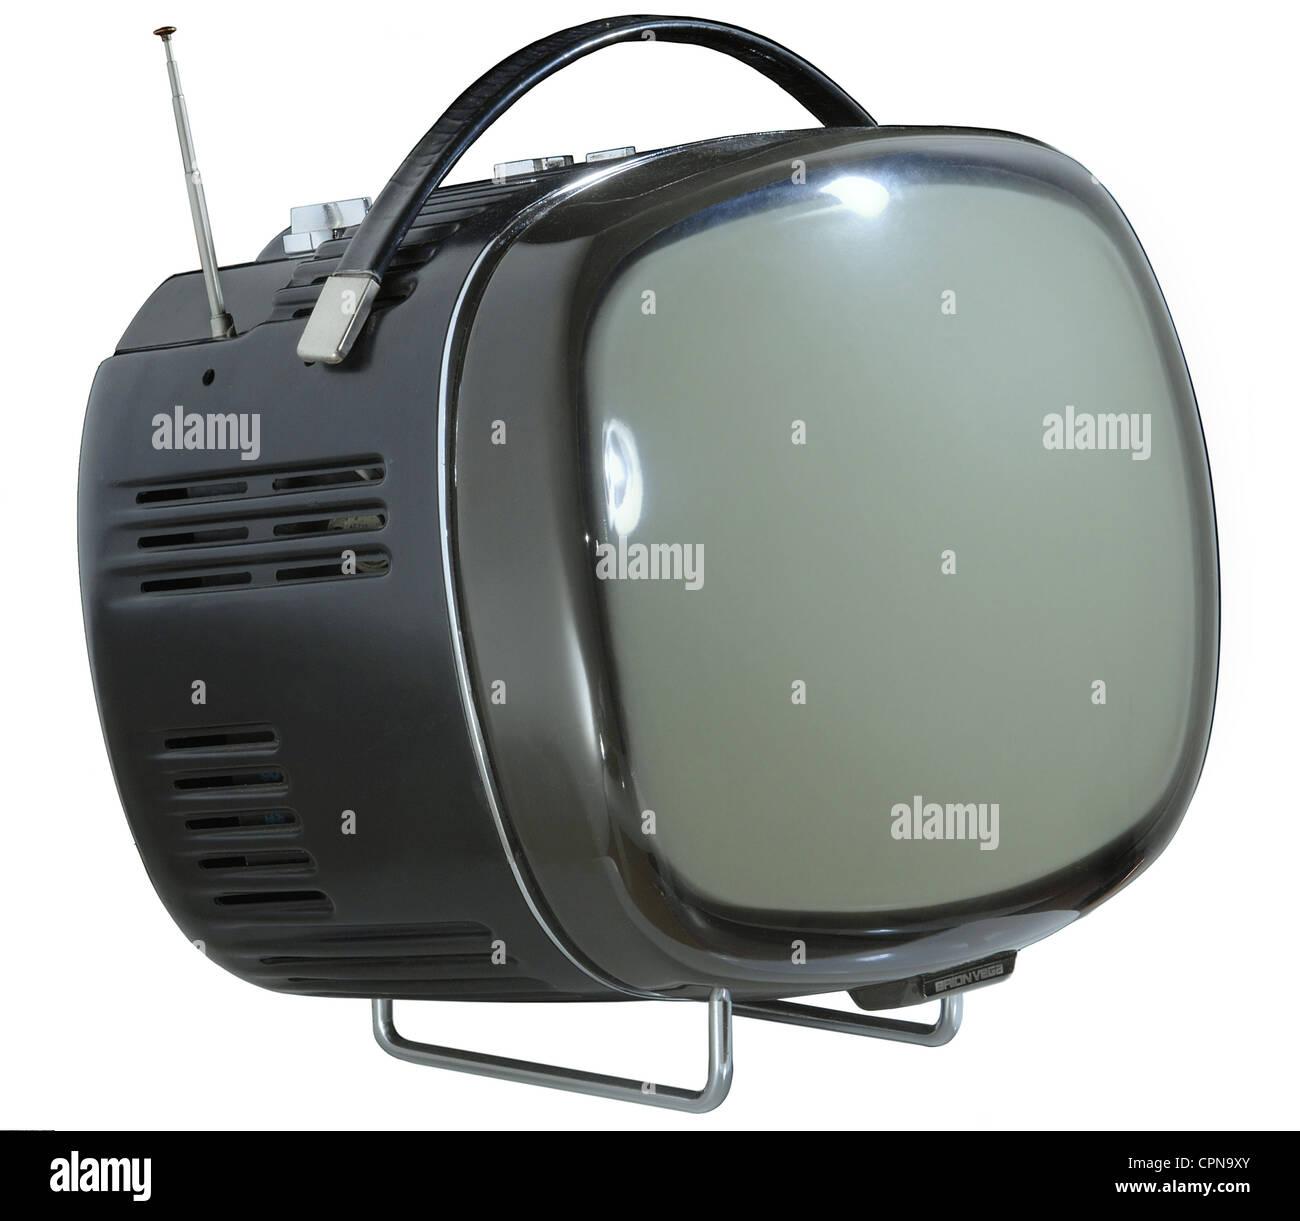 broadcast, television, television set, Brionvega Doney 14, designed ...